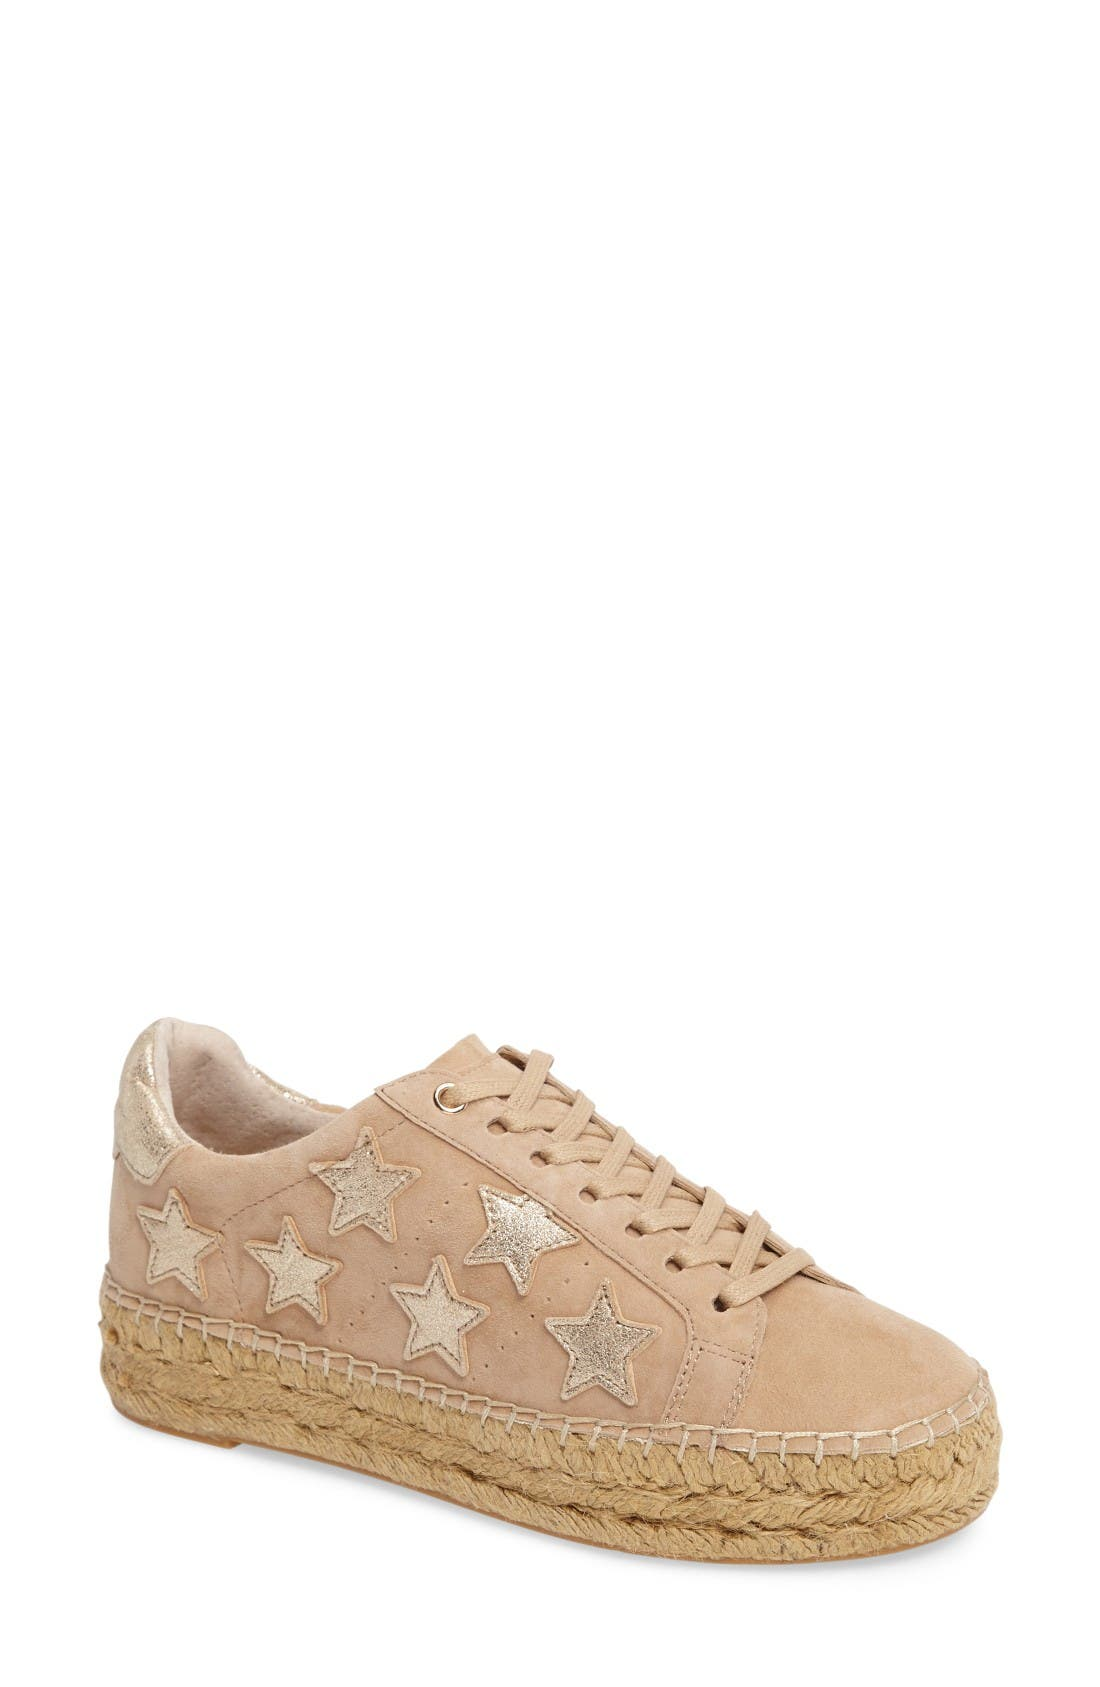 Marc Fischer LTD Marcia Espadrille Sneaker (Women)